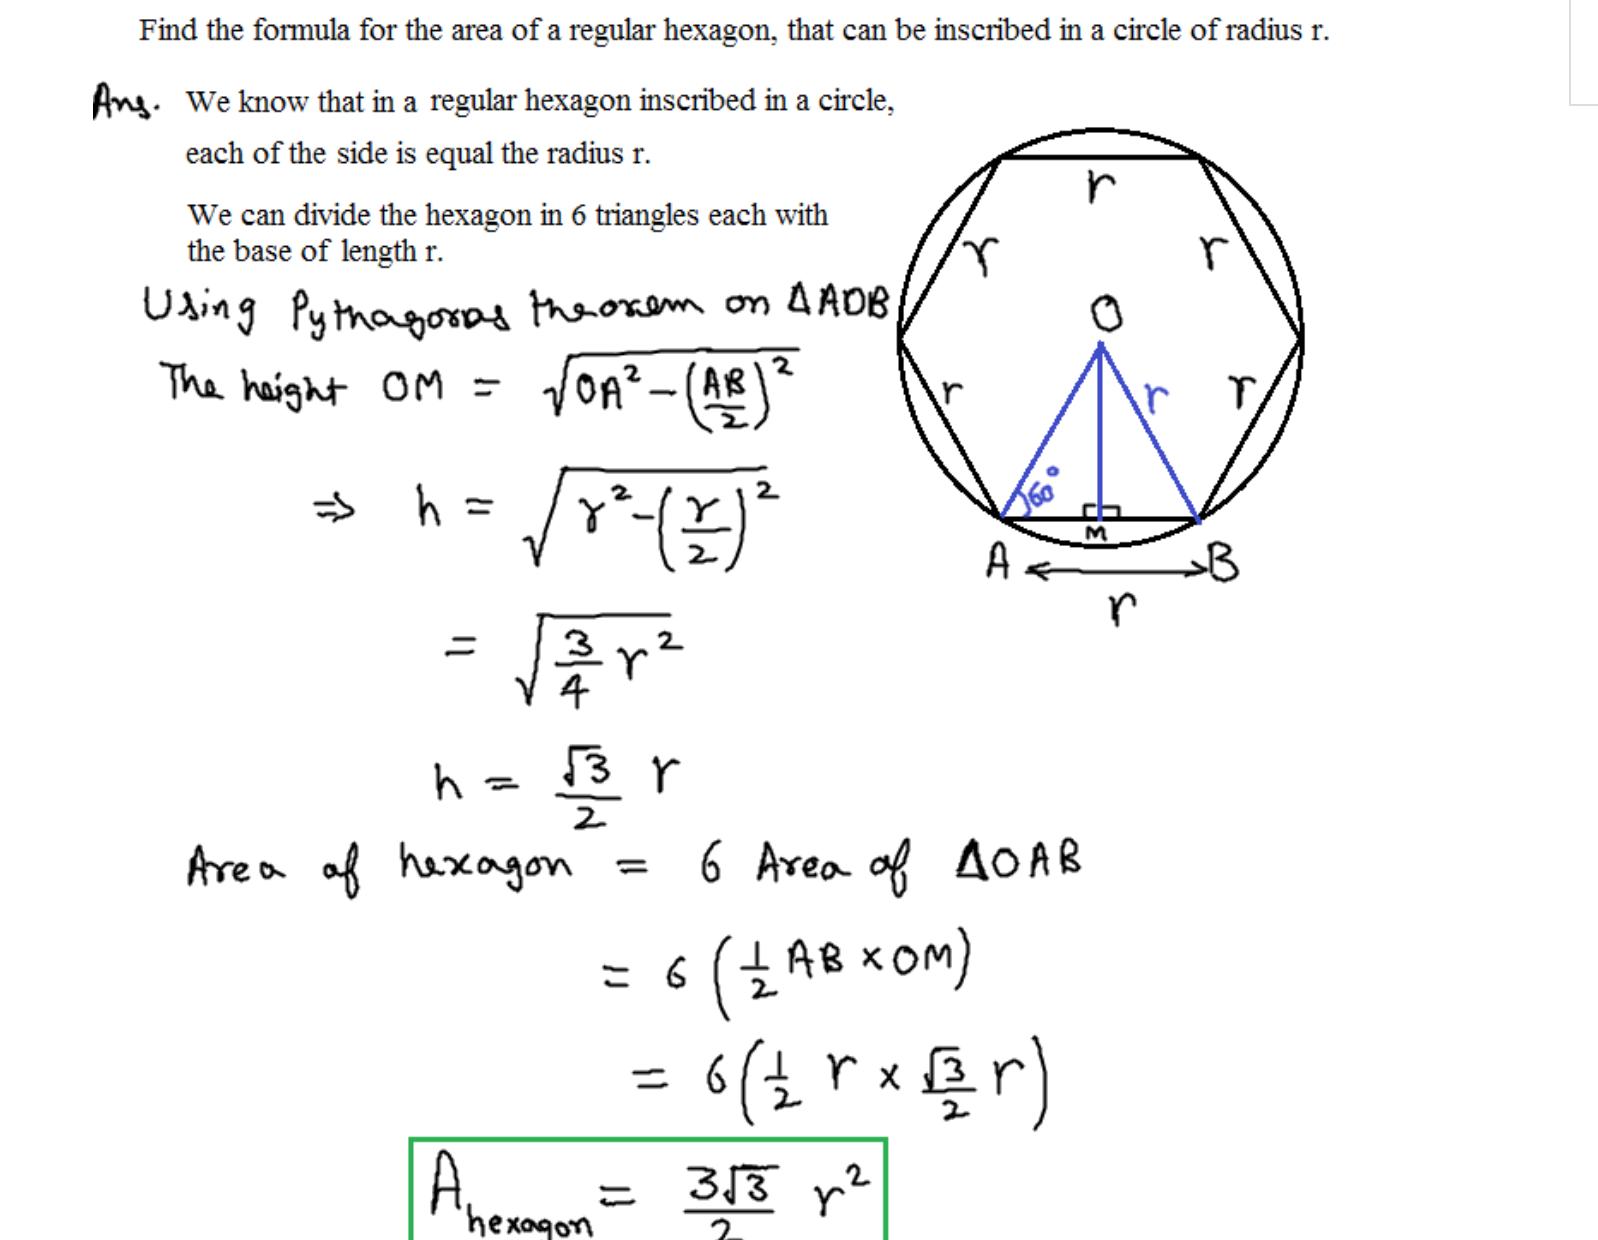 Constructing regular hexagon inscribed in circle